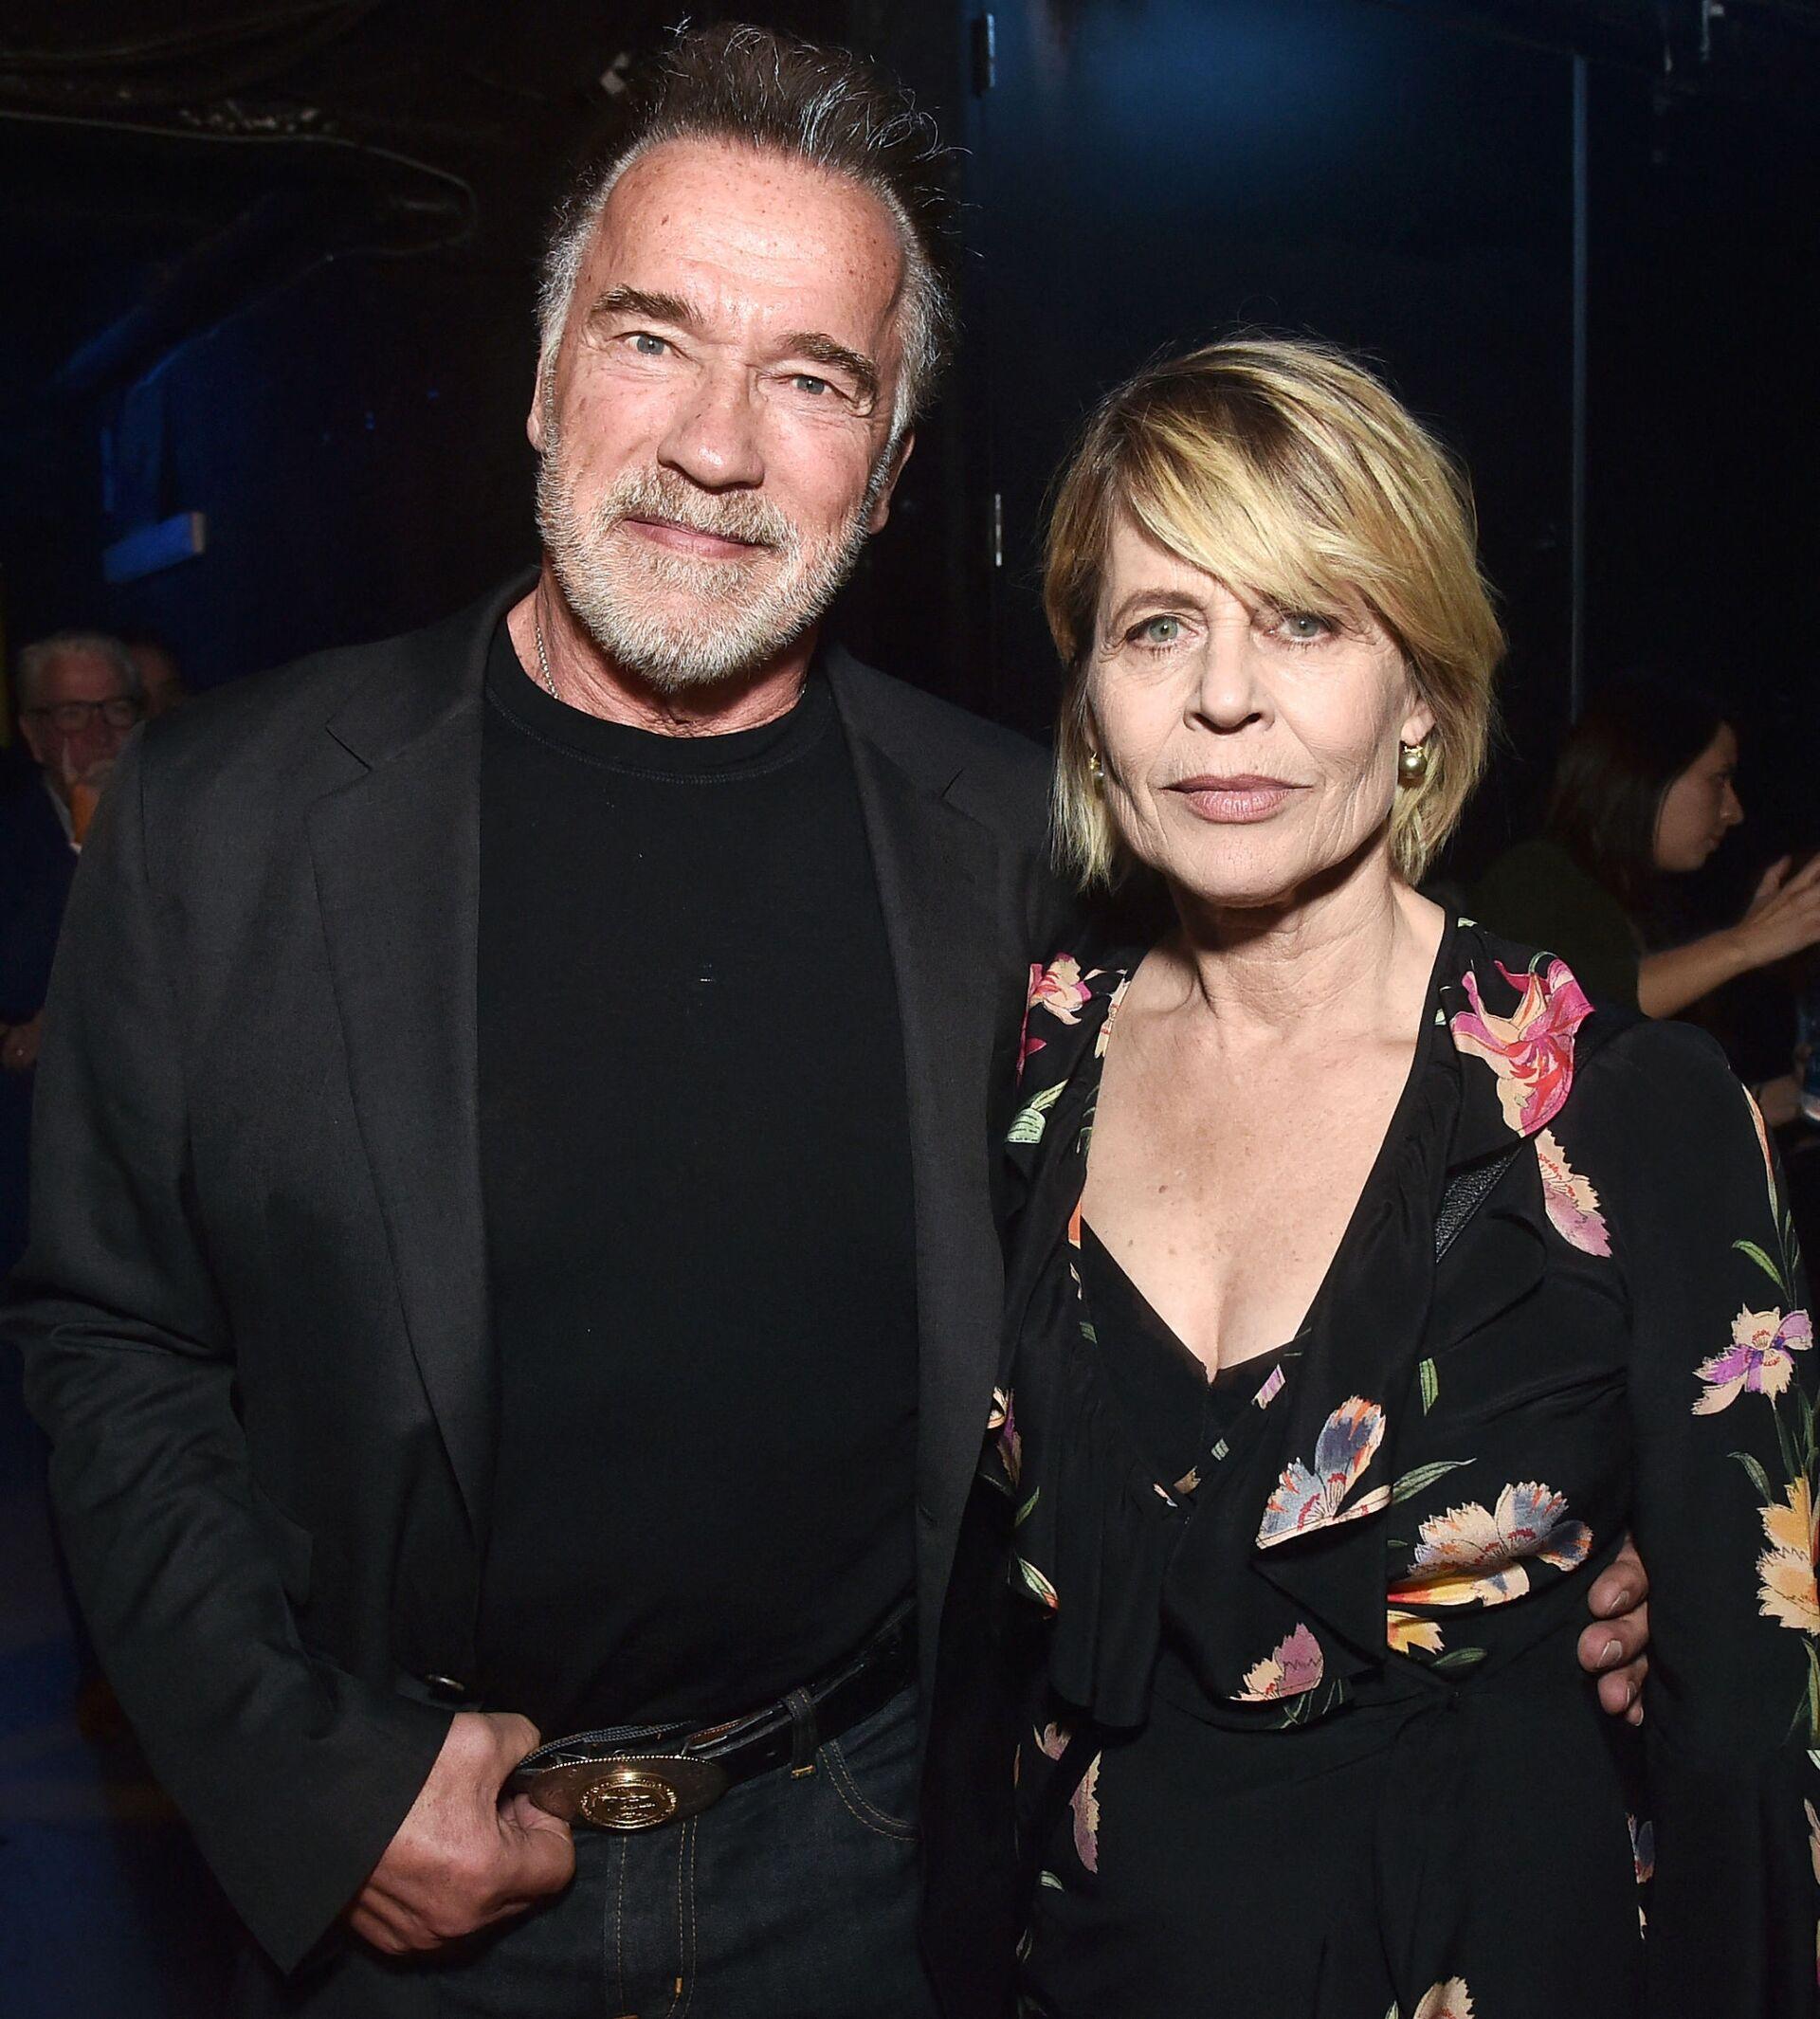 Арнольд Шварценеггер и Линда Хемильтон на CinemaCon 2019 - Sputnik Азербайджан, 1920, 01.10.2021